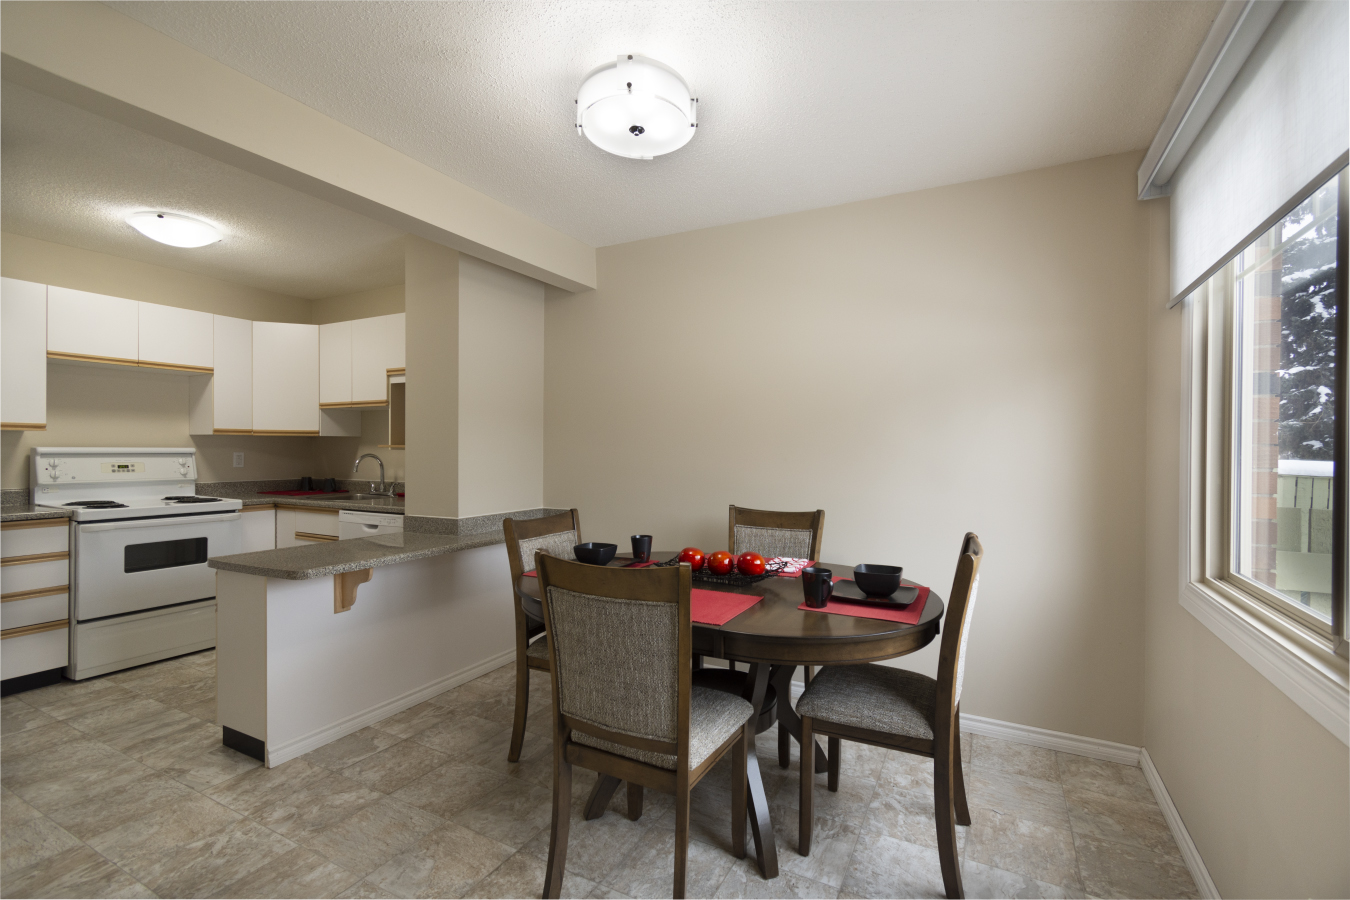 MHA_Westland Park_2019_Classic Dining Room